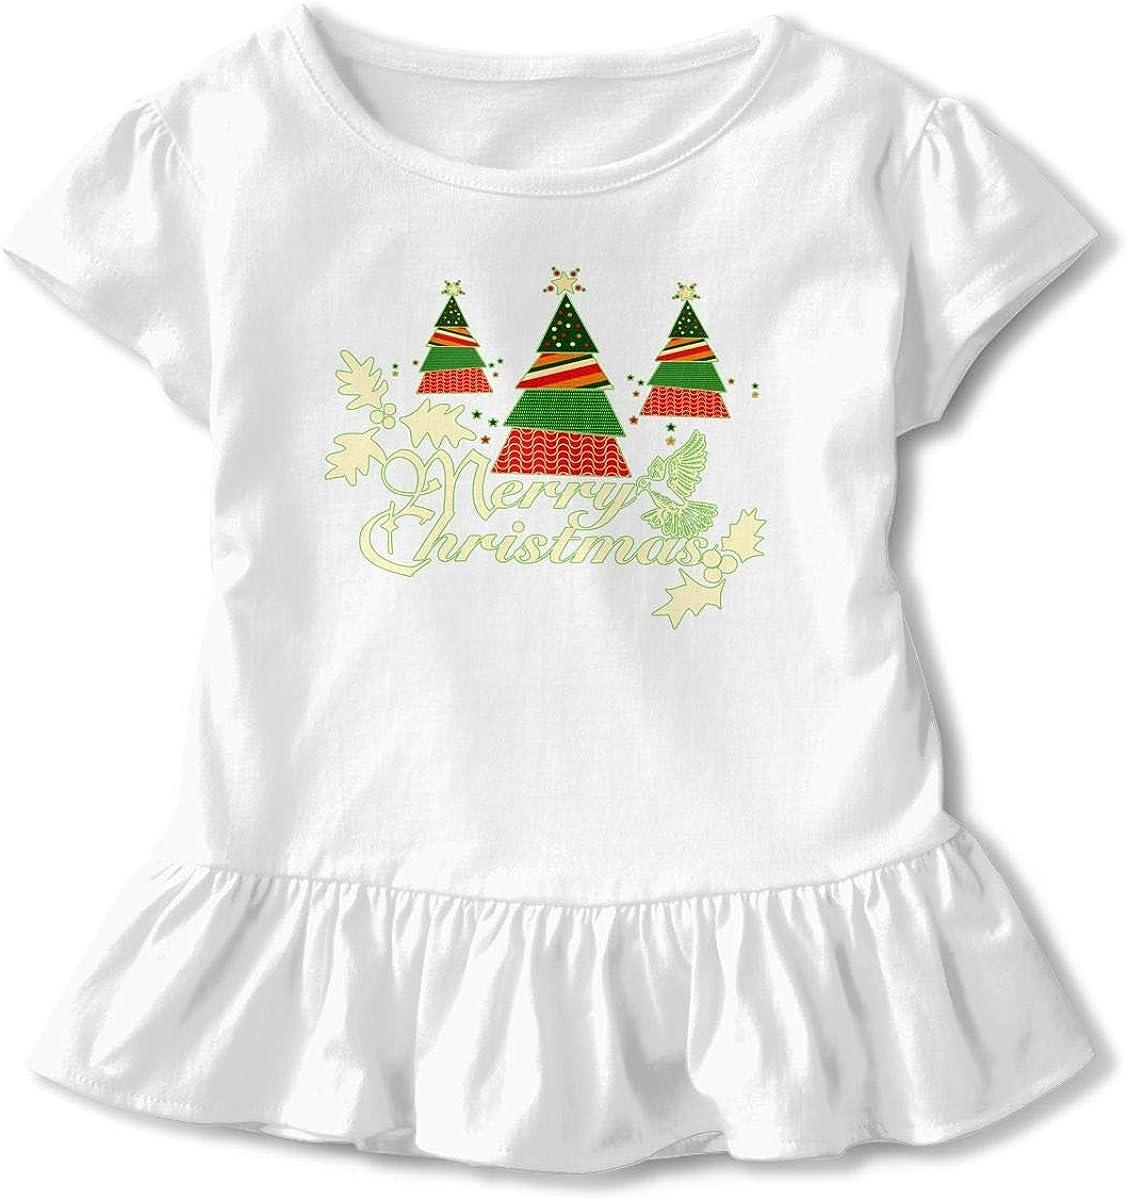 NMDJC CCQ Merry Christmas Baby Skirts Fashion Kids T Shirt Dress Cotton Flounces Outfits